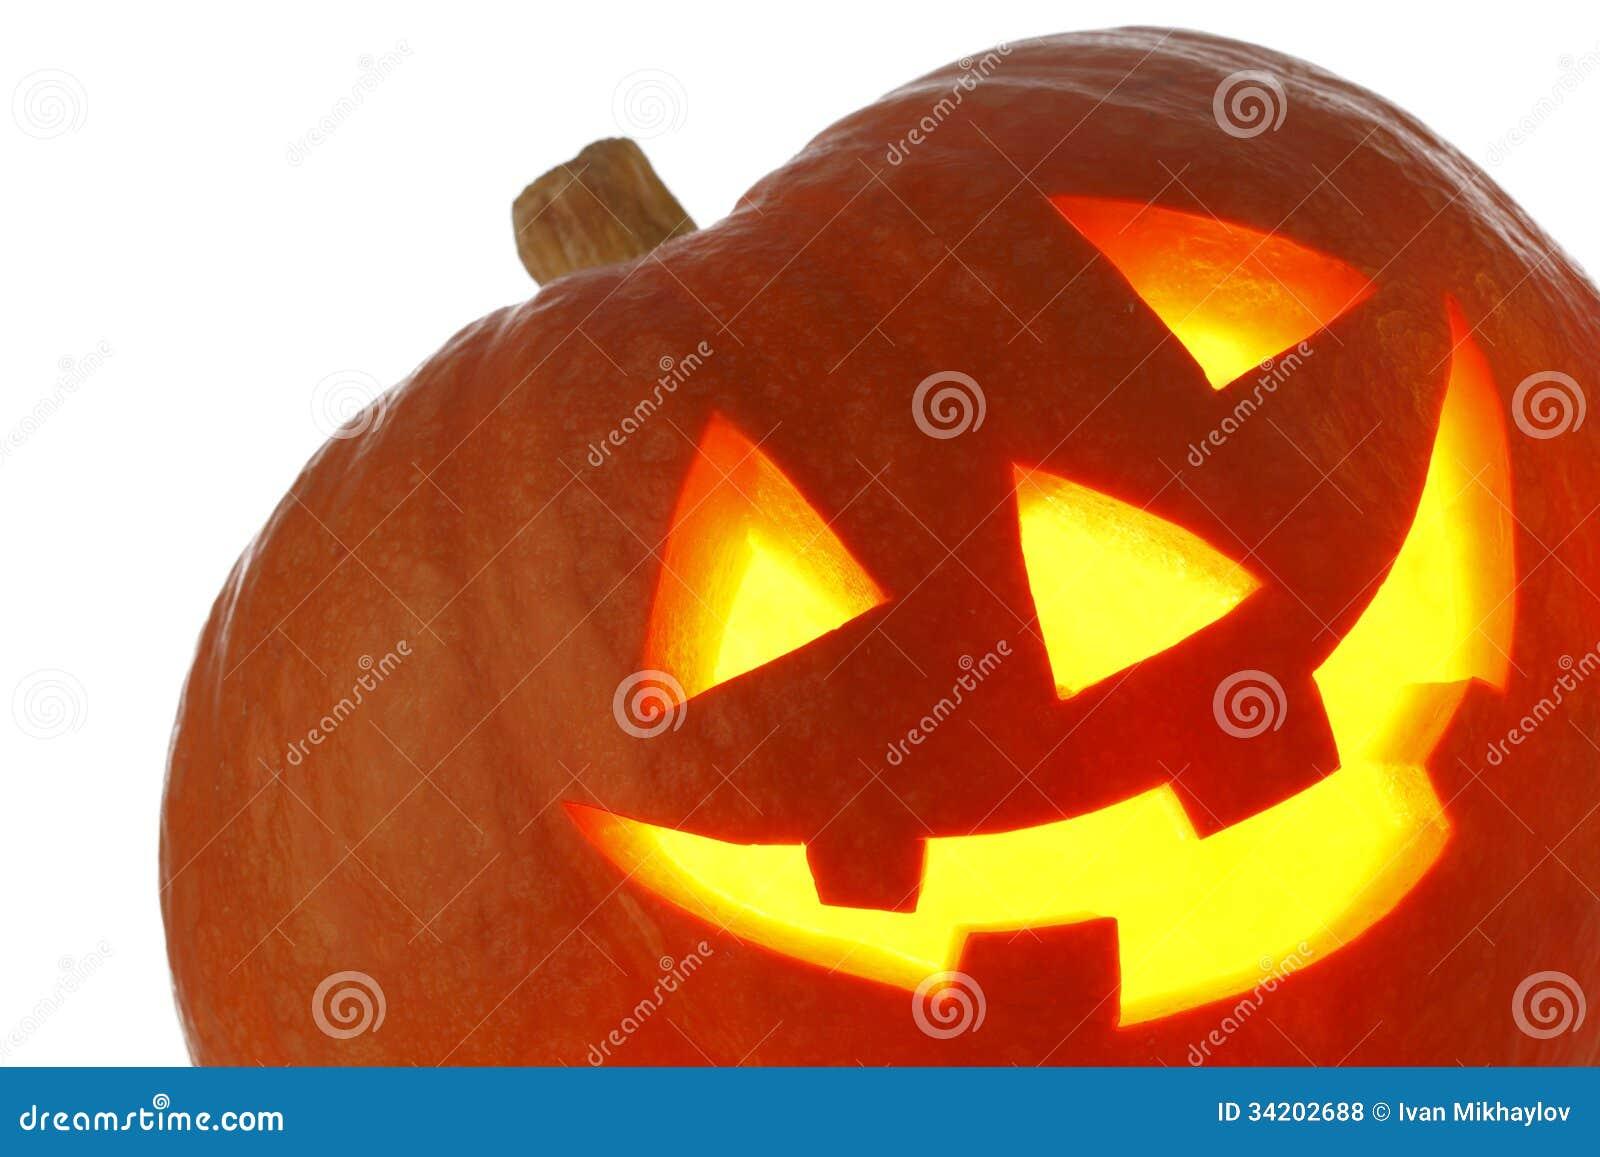 halloween pumpkin royalty free stock photos image 34202688